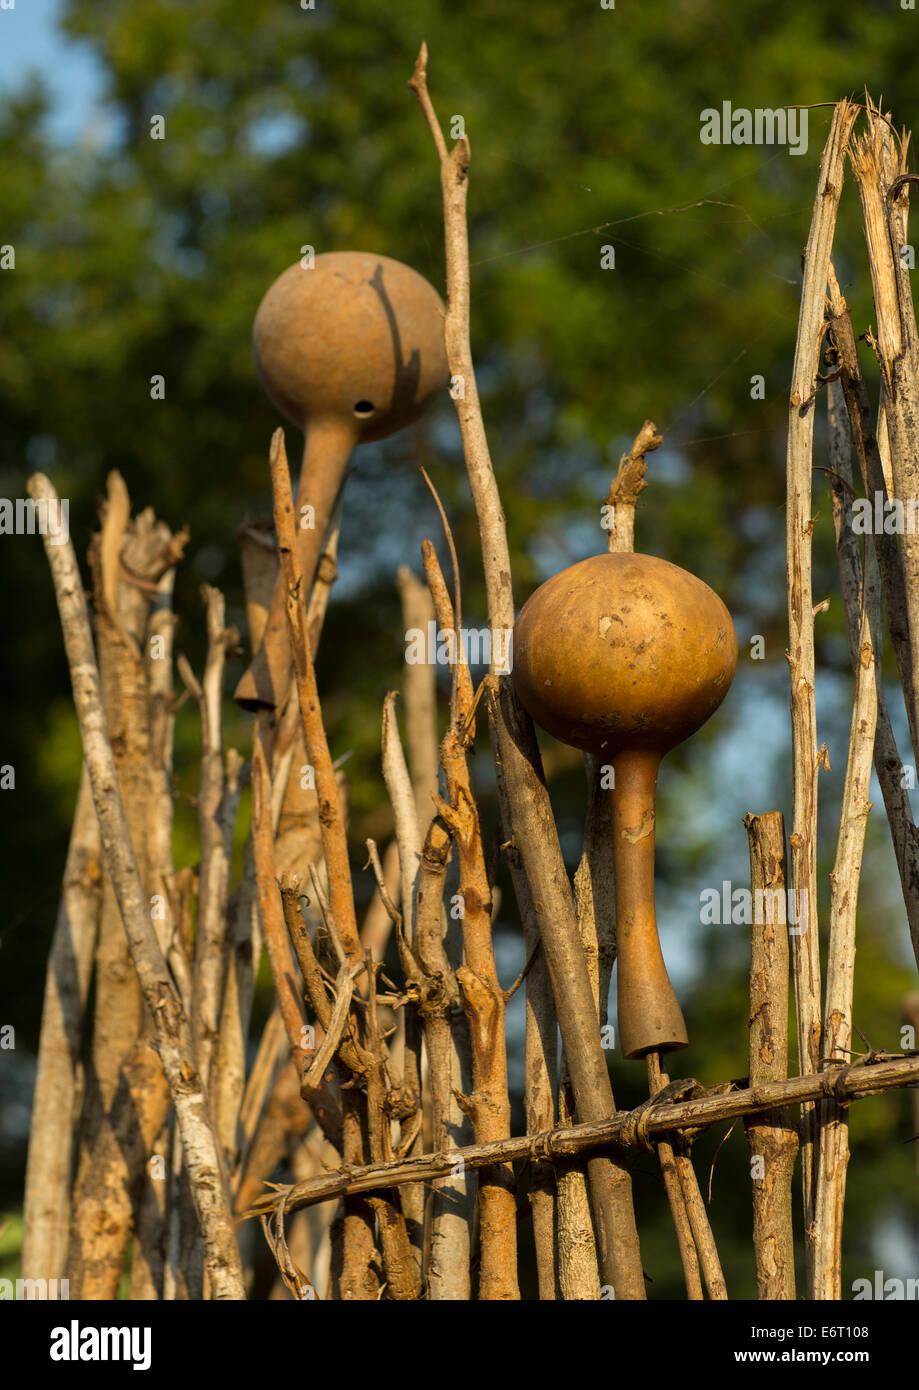 Calabashes In Abobo, Former Anuak King Village, Gambela Region, Ethiopia - Stock Image